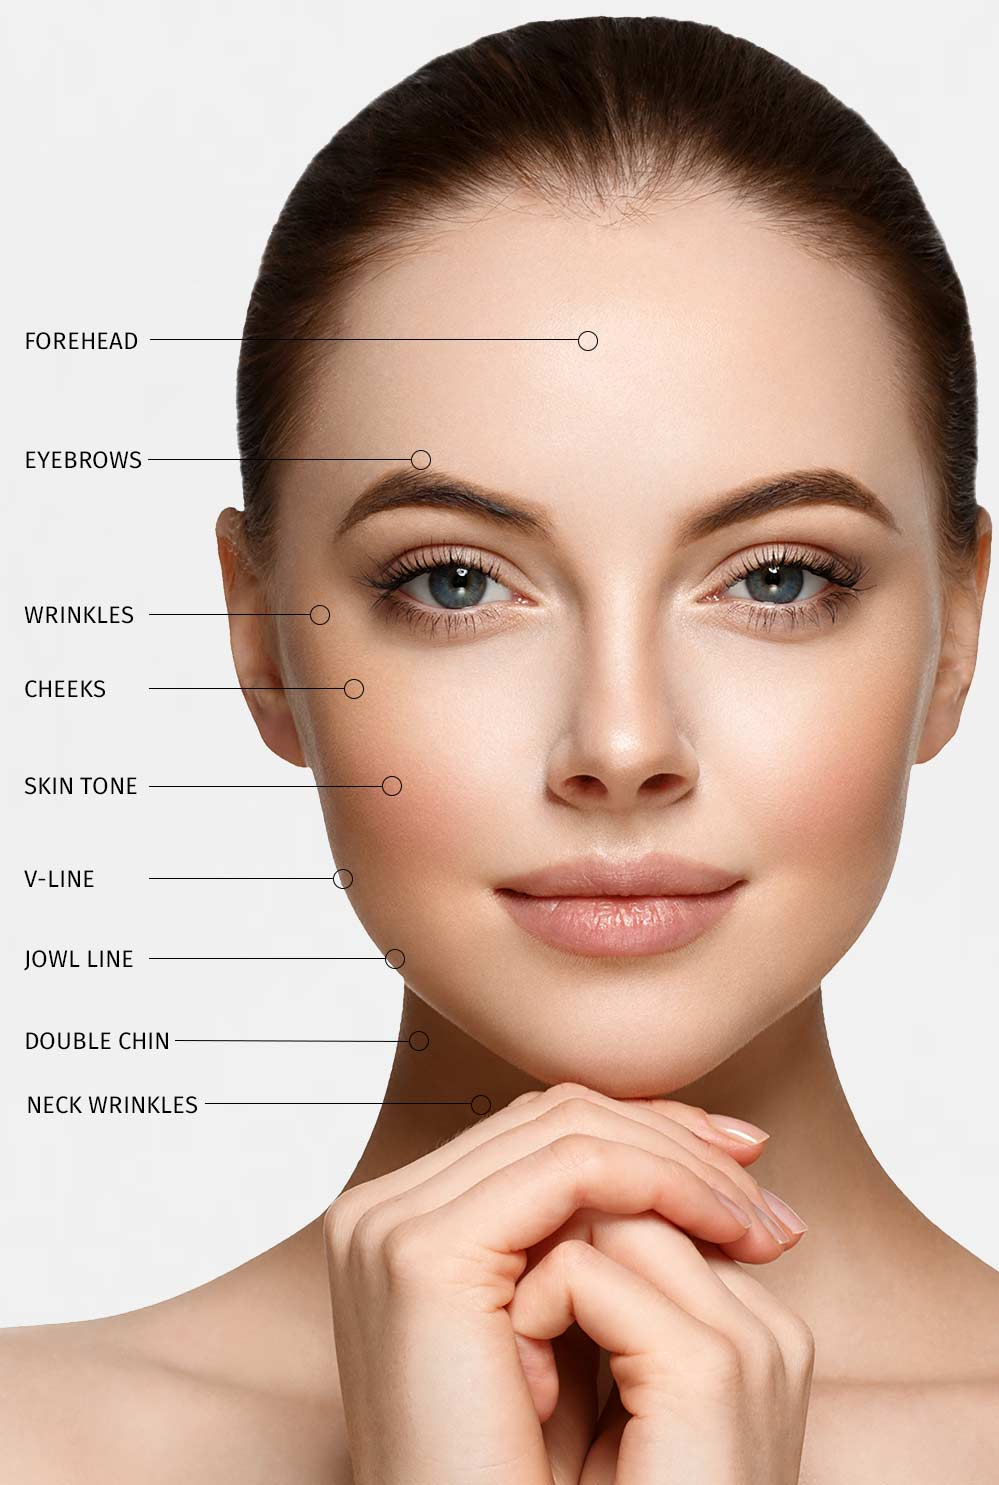 Skin Tightening Treatments Areas on Face